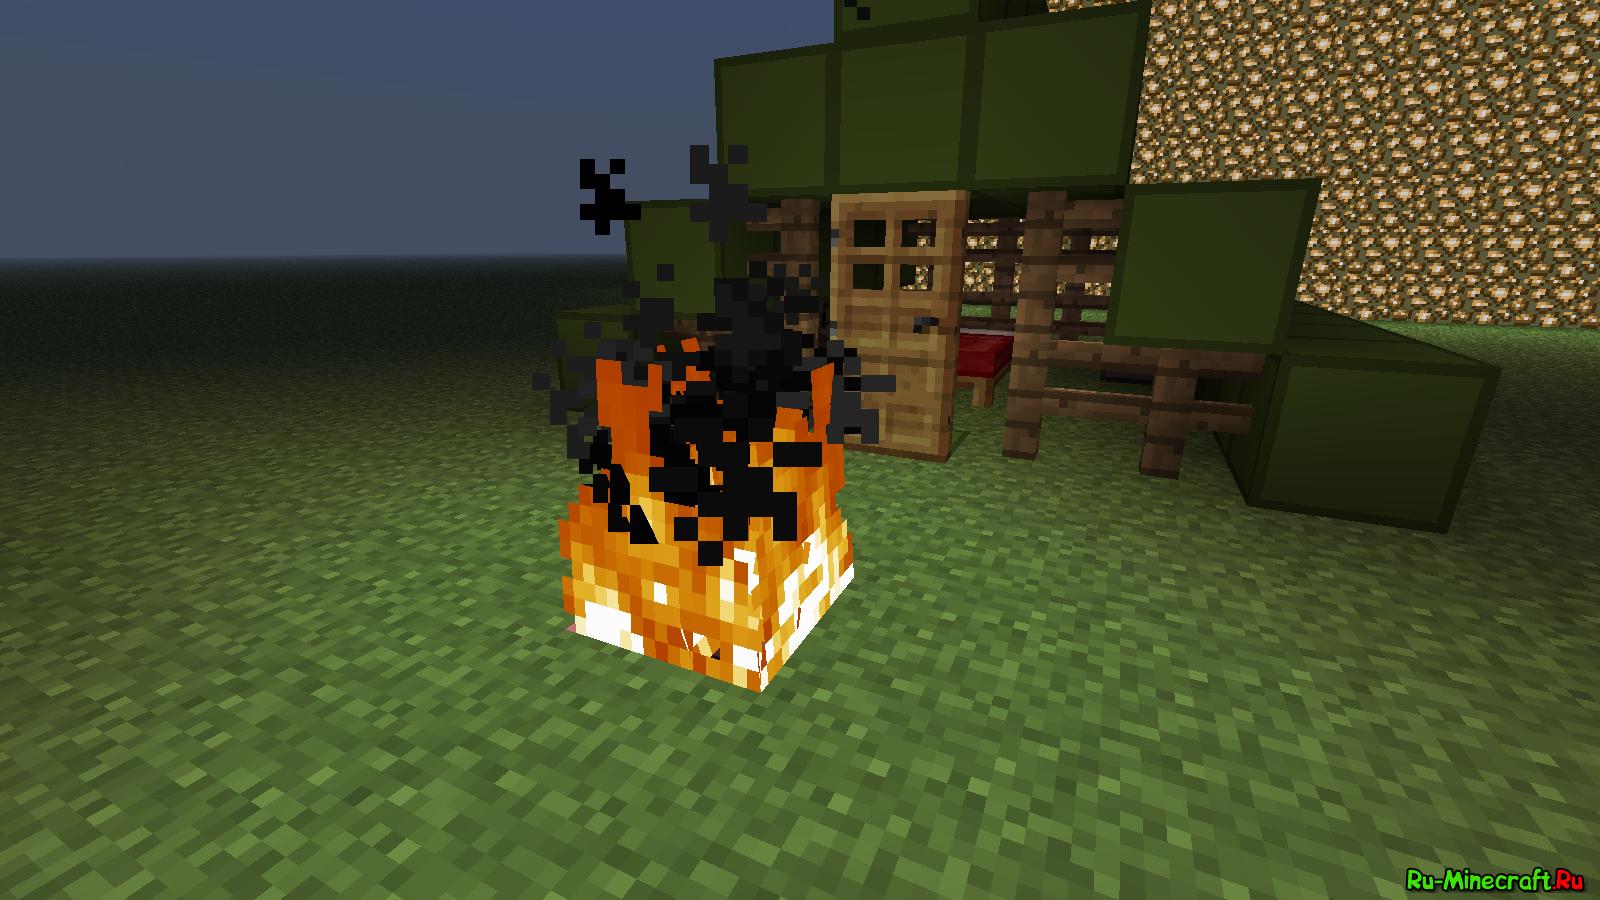 Картинки: Как установить Minecraft, установка майнкрафта на Win 7 (Картинки)